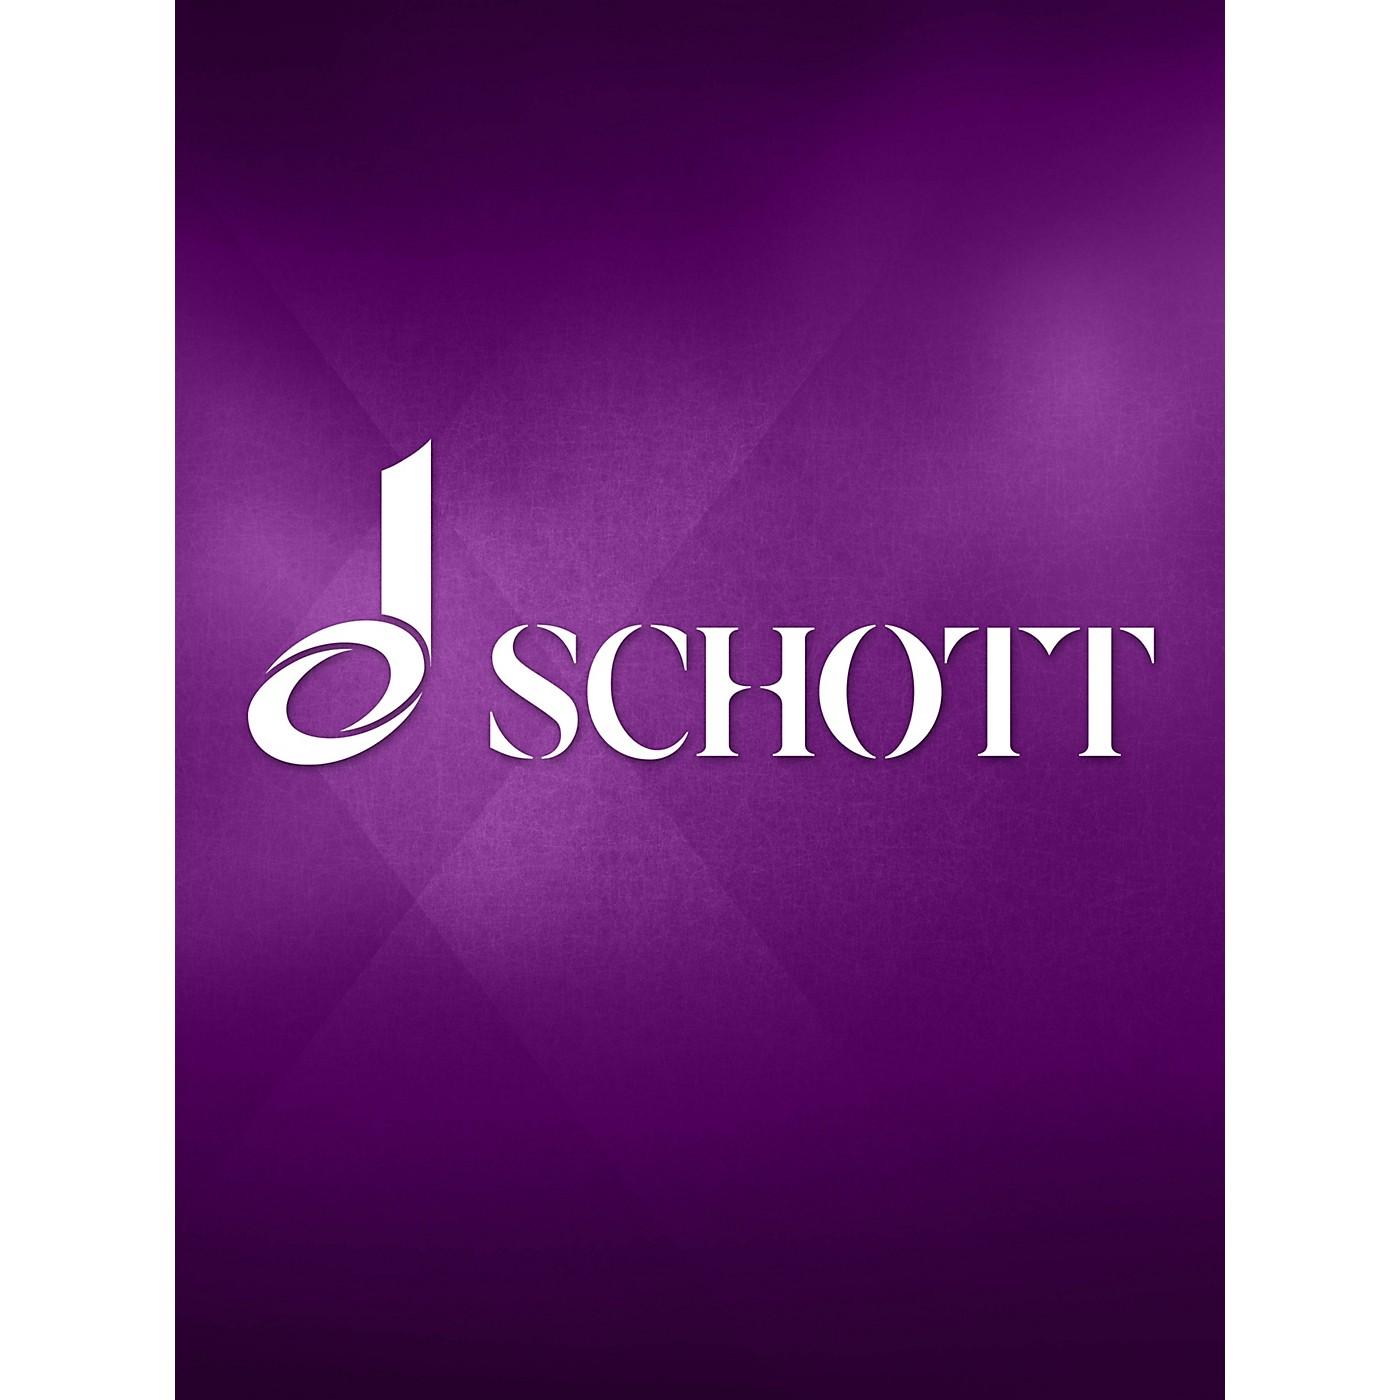 Schott Kammermusik #5 Op. 36, No. 4 (Viola and Piano) Schott Series thumbnail